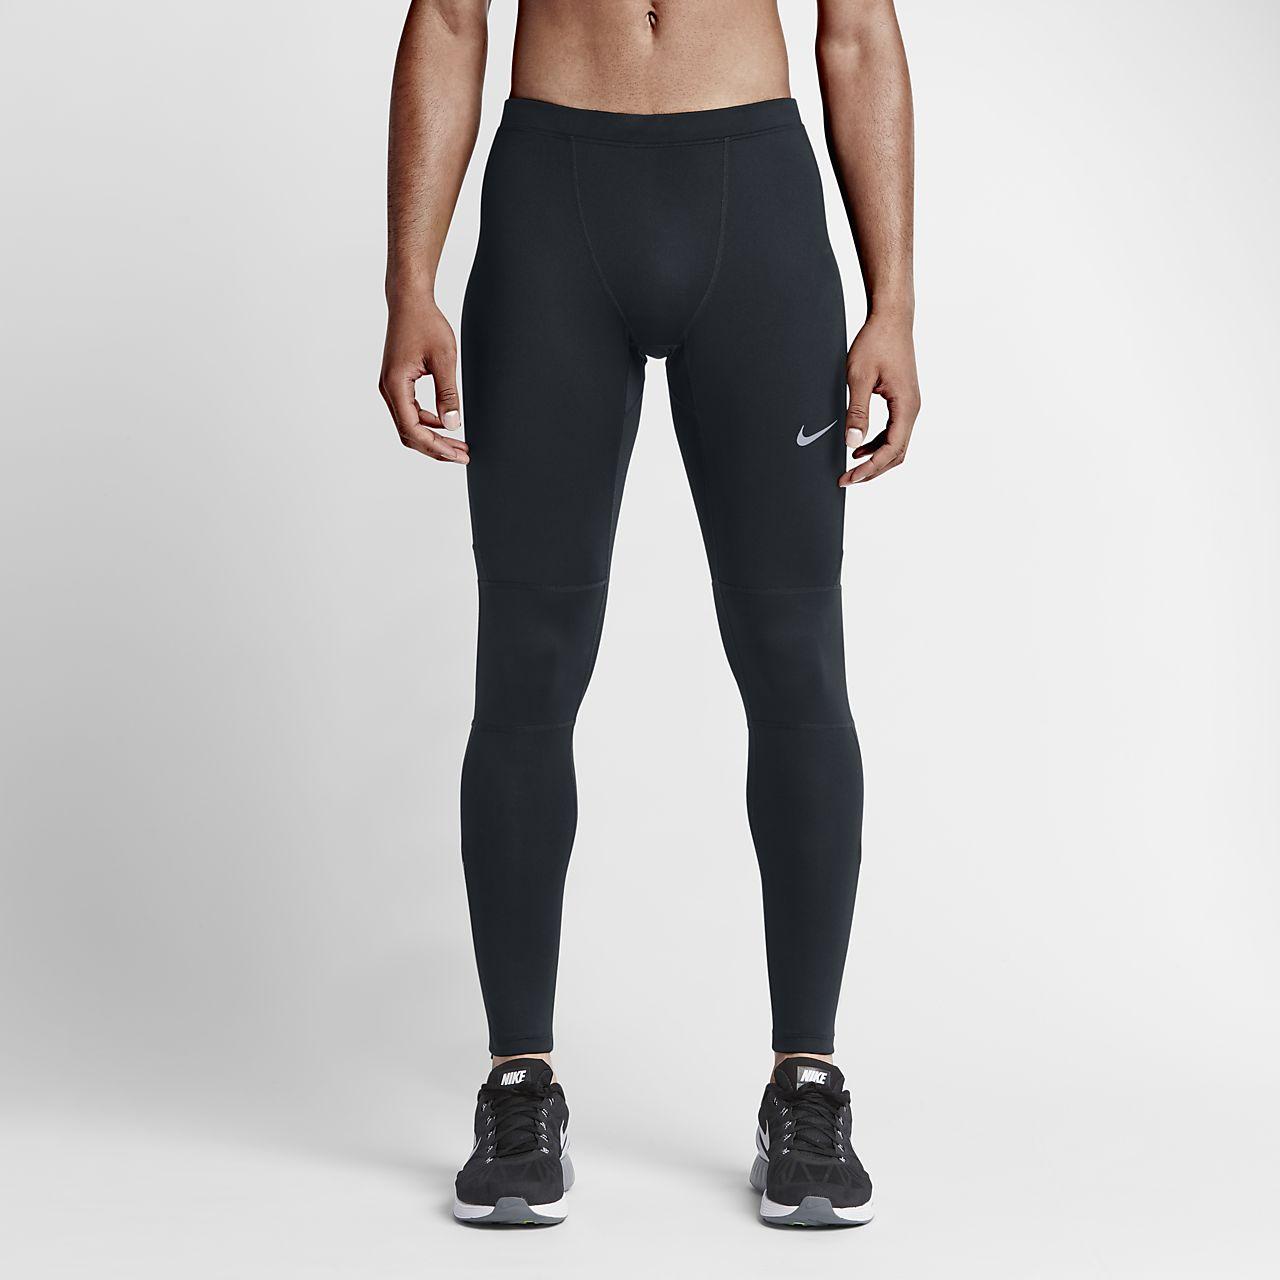 Nike Nike Essential Running Tights Black/Black/Black FUE